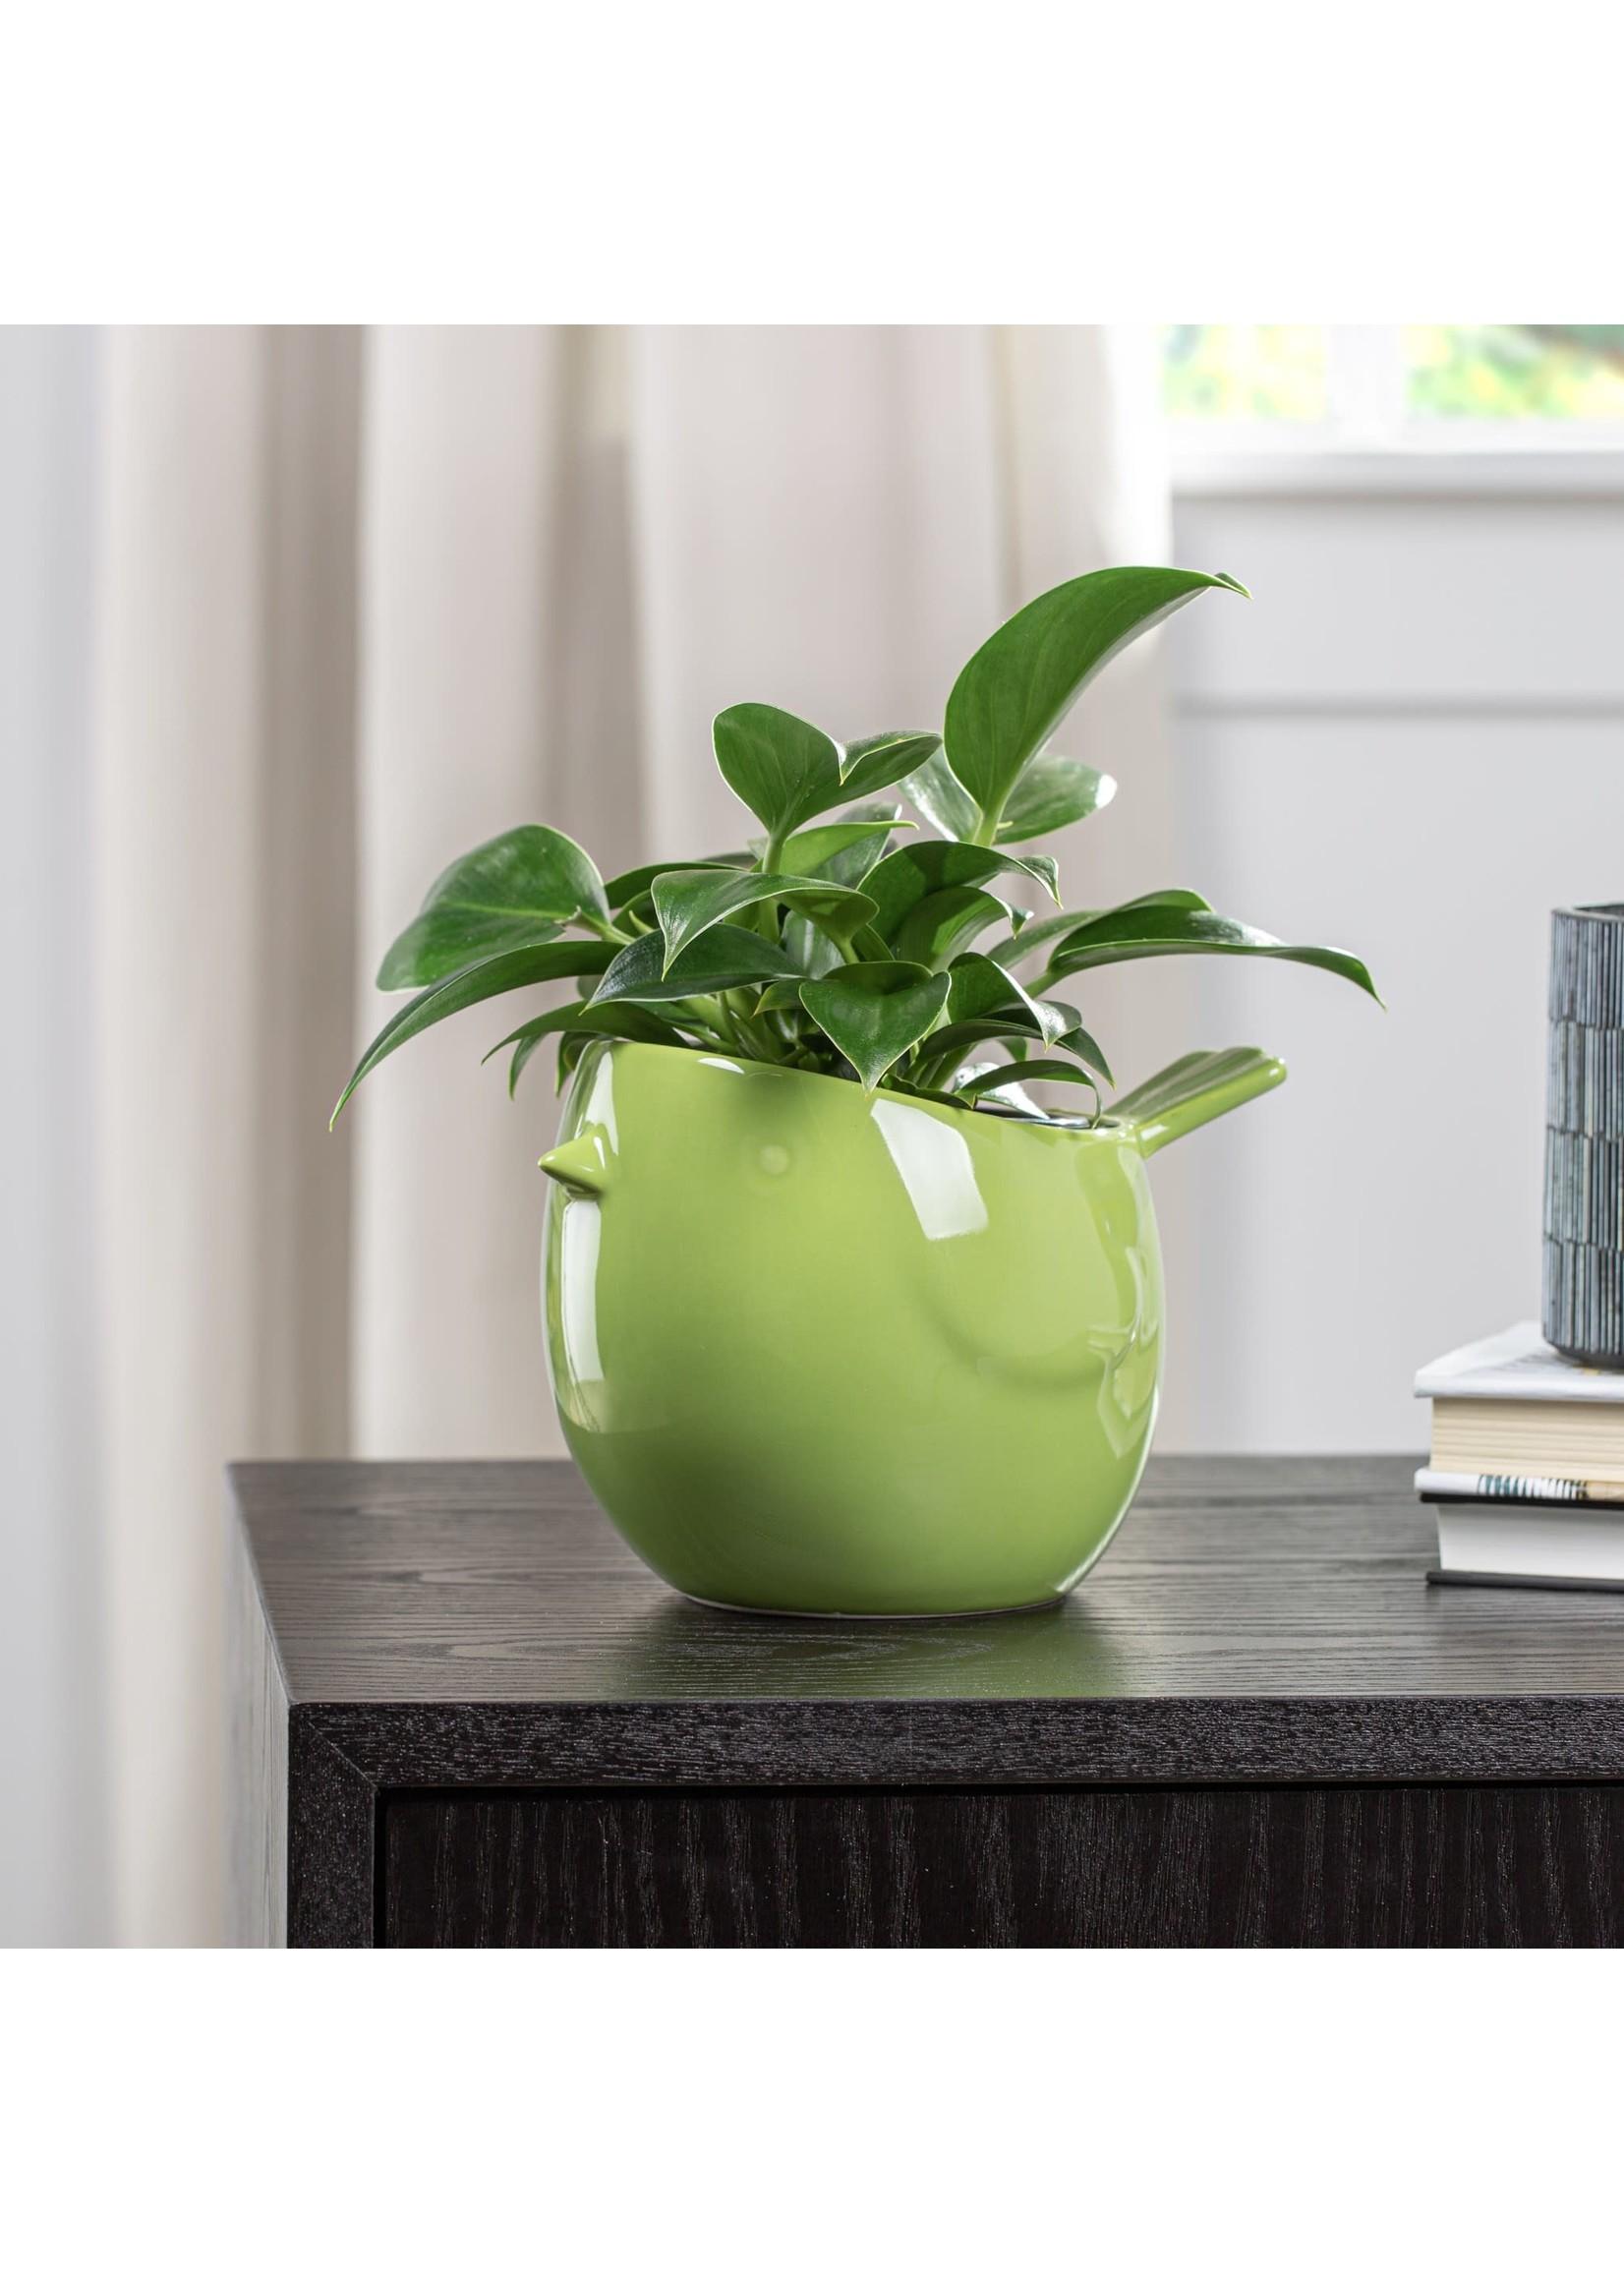 Torre & Tagus Finch Ceramic Pot - Green